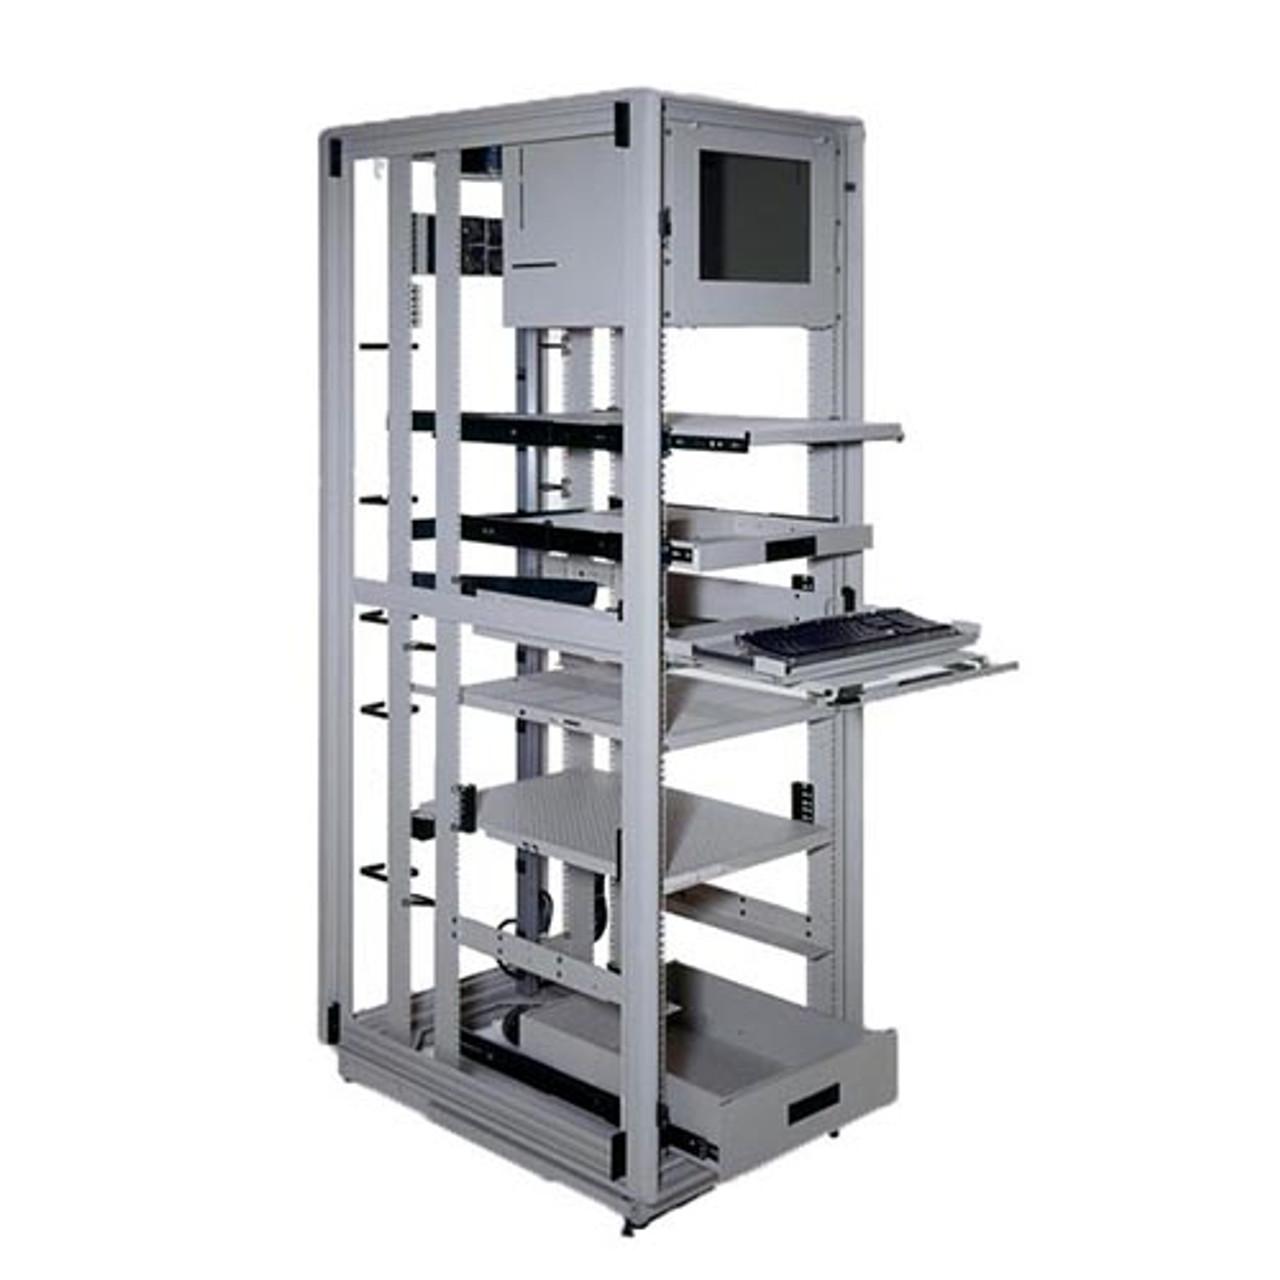 40u 30 D Heavy Duty 4 Post Server Rack